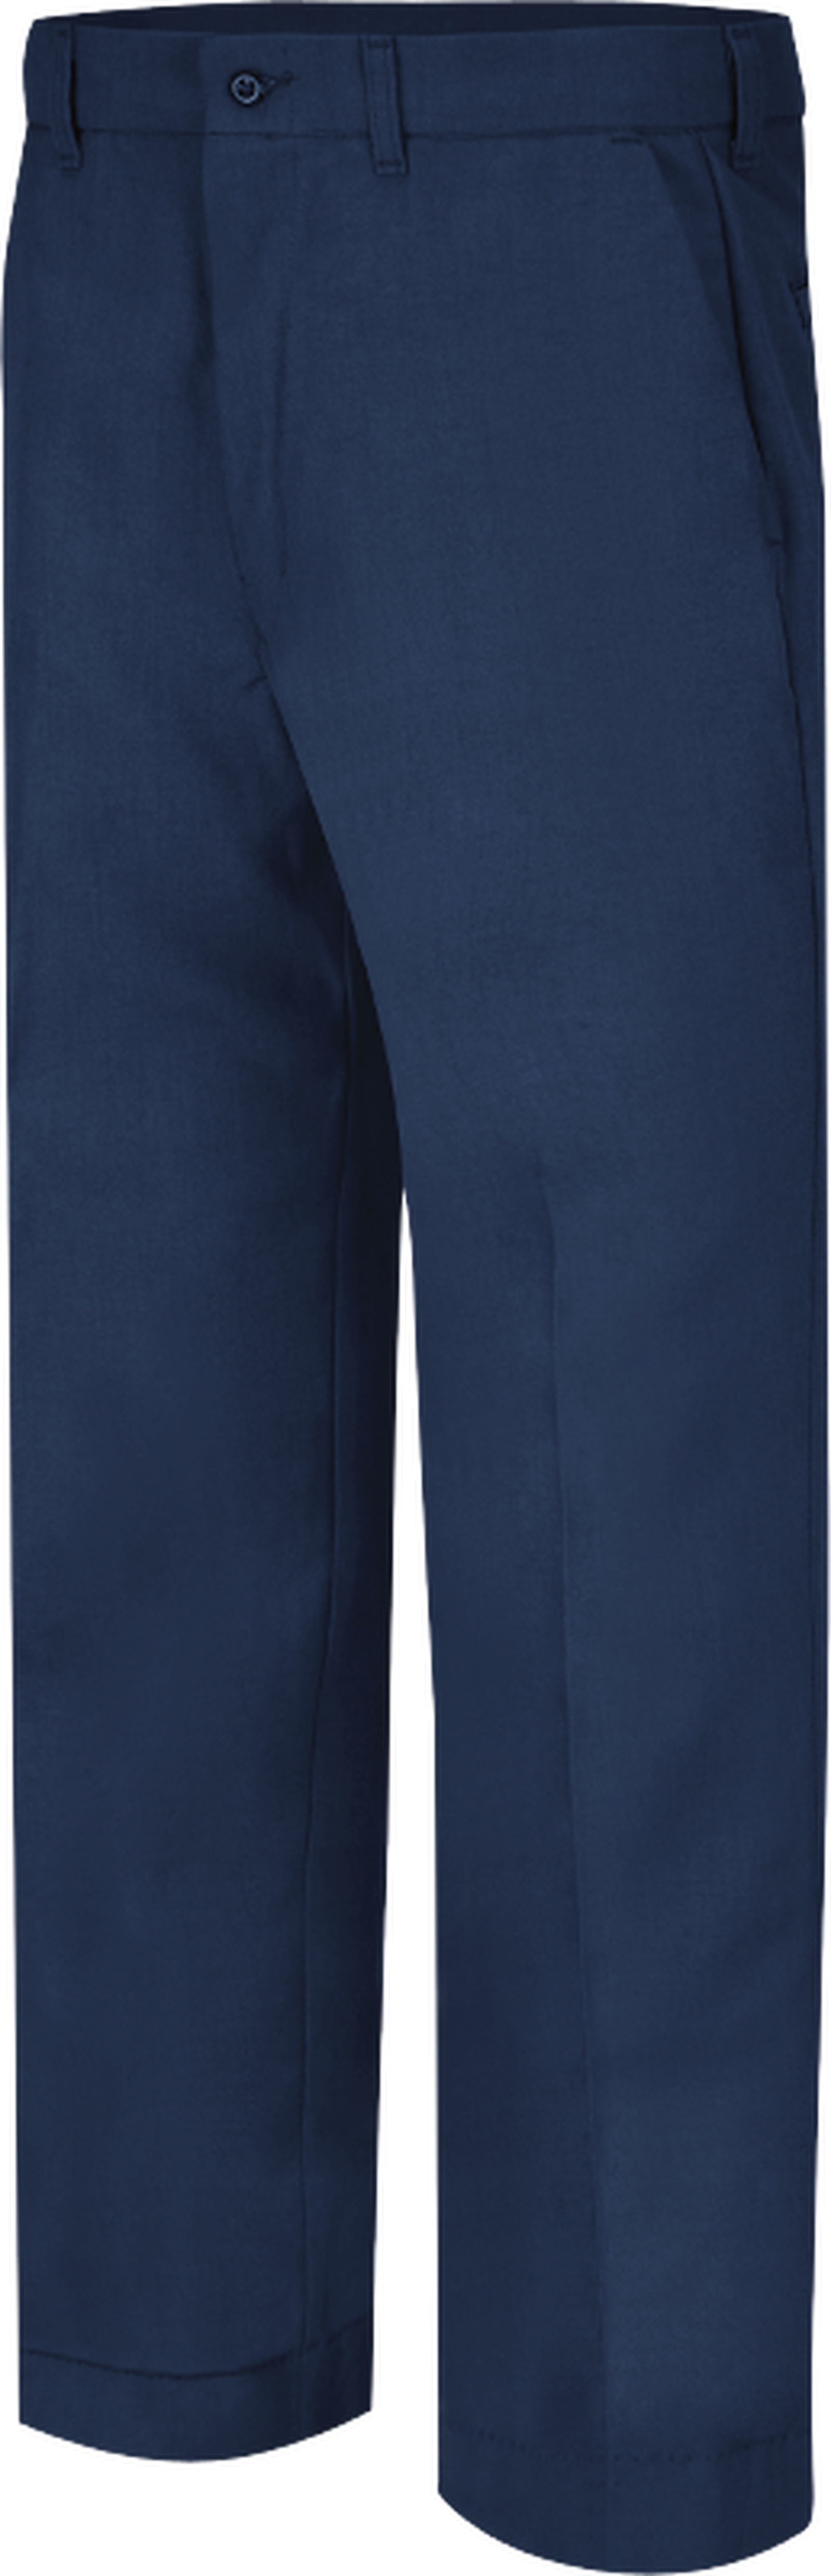 Men's Lightweight Nomex FR Work Pant